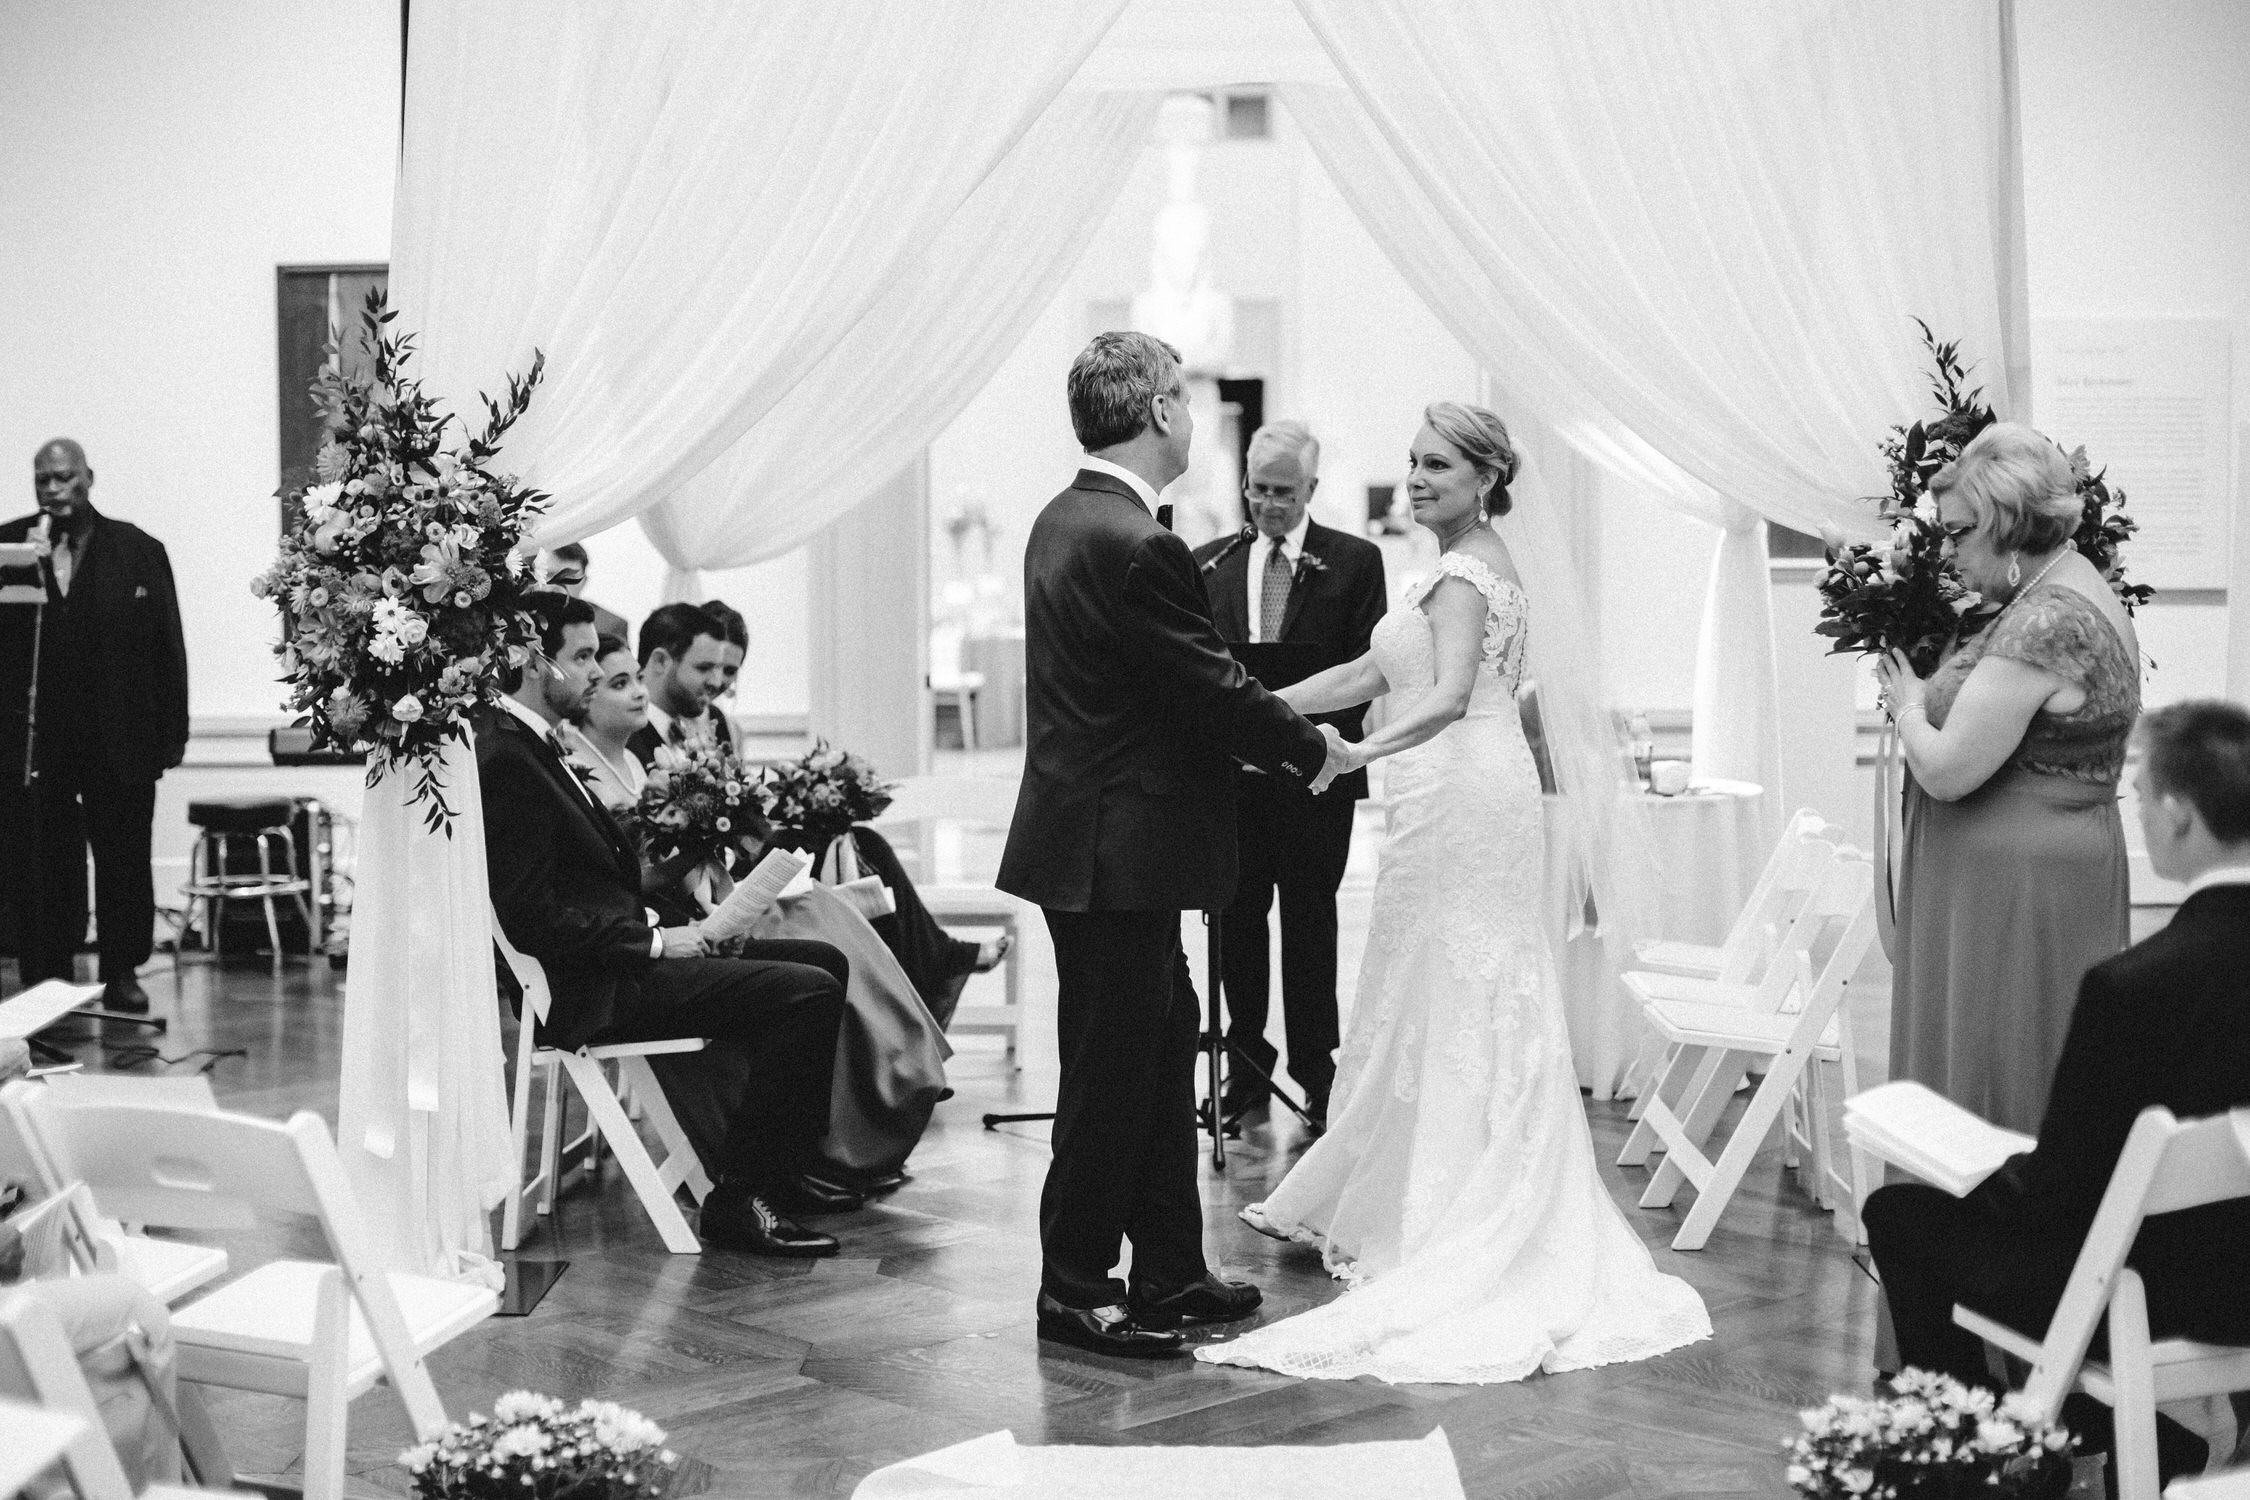 St Louis Art Museum Wedding, second wedding